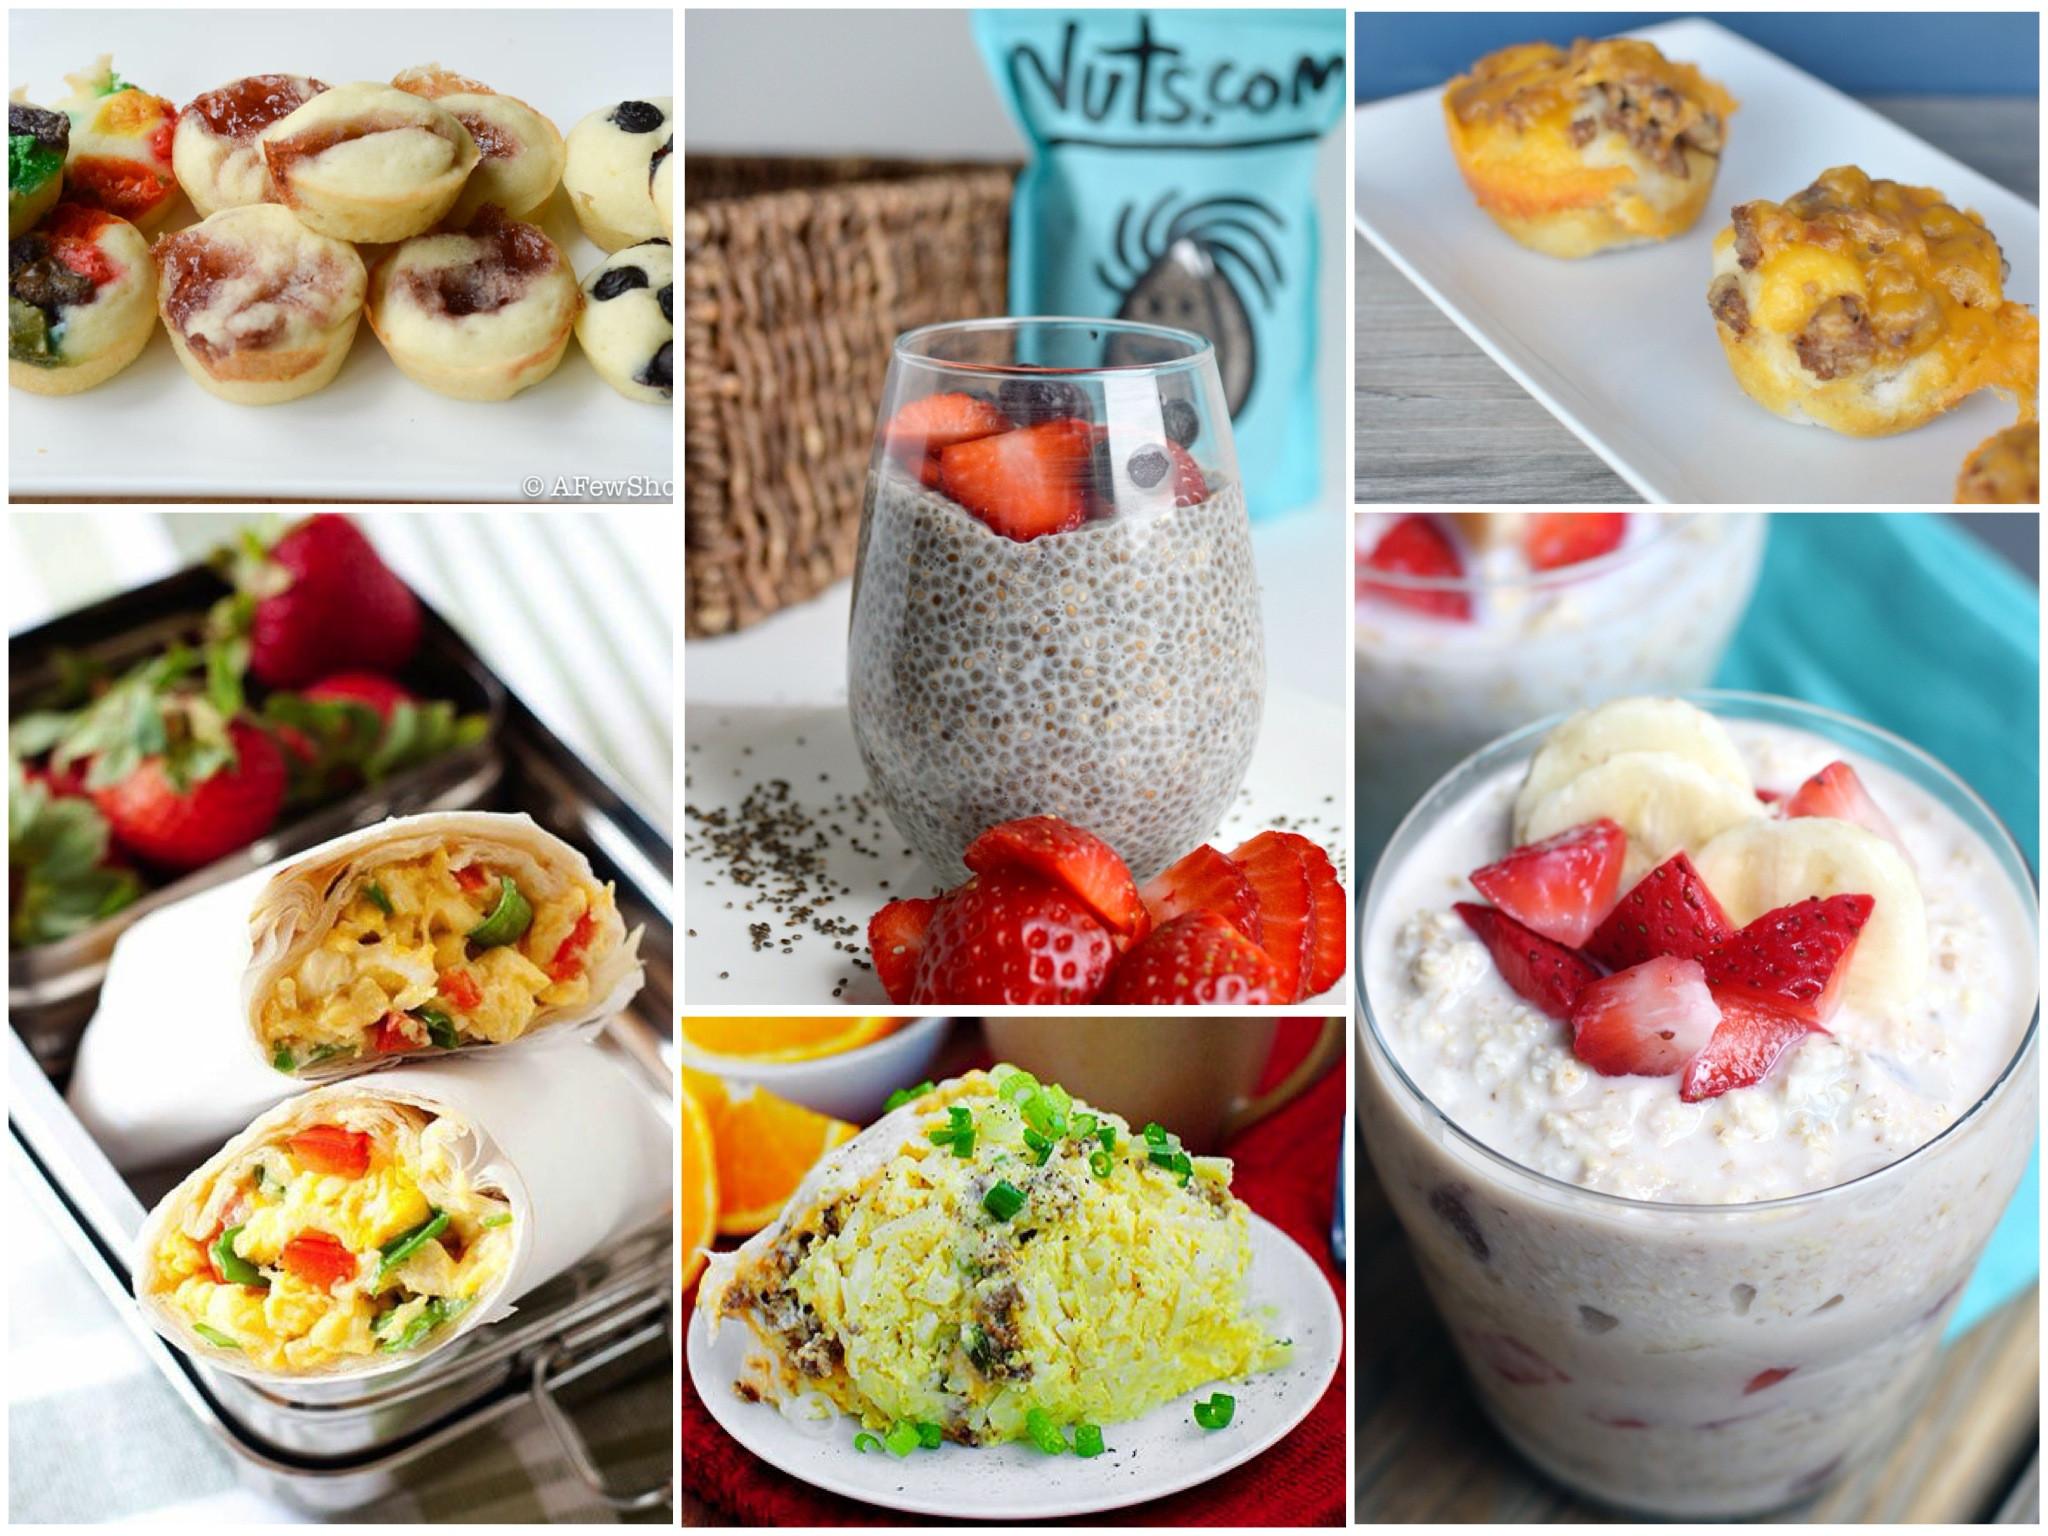 Healthy Breakfast For Kids Before School  12 The Go Breakfasts for Busy School Mornings